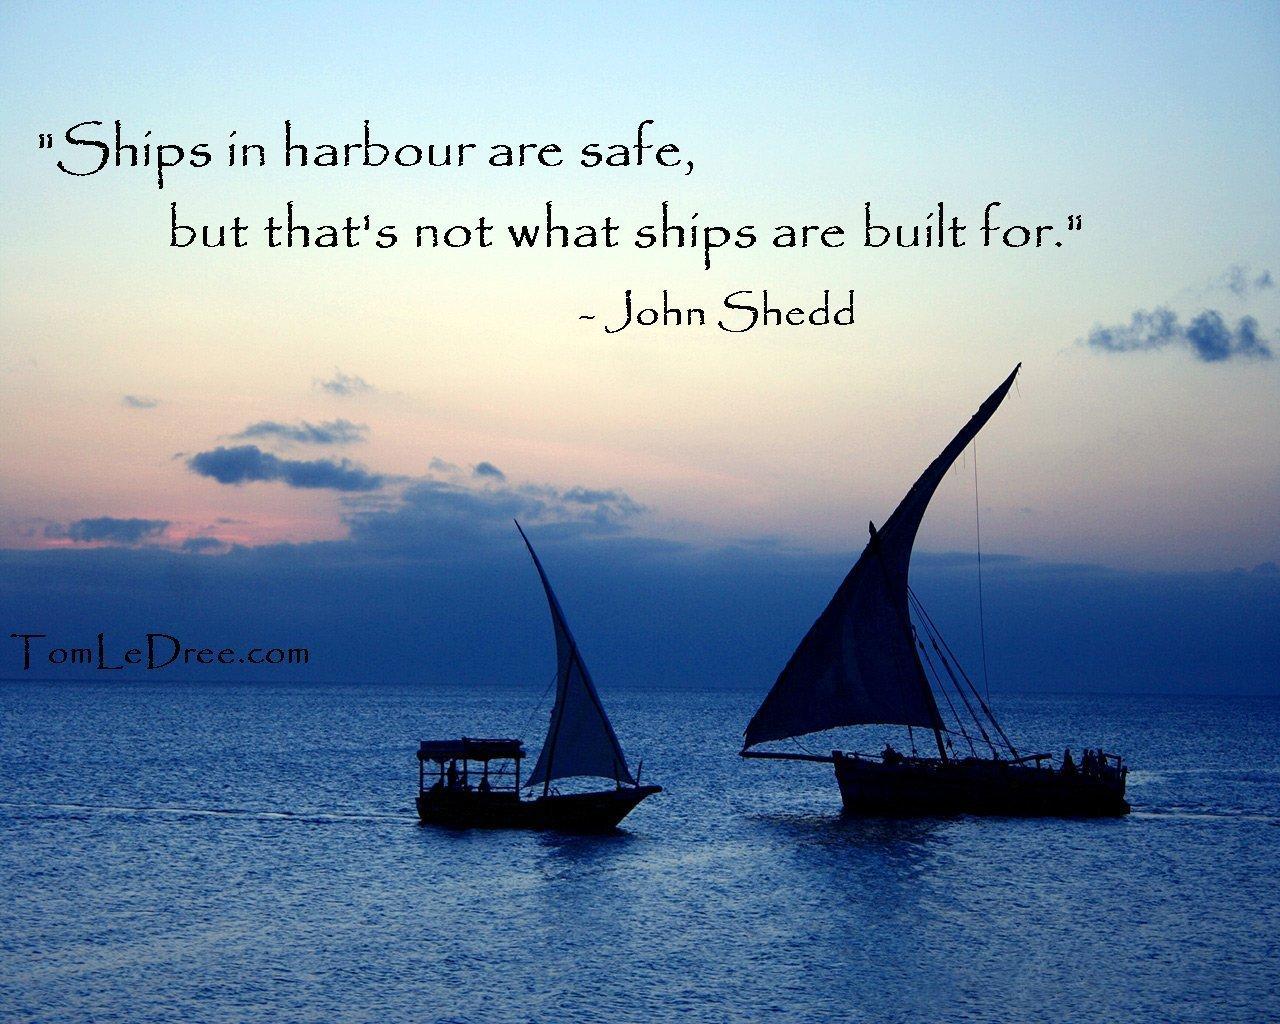 Cruise Ship Funny Quotes Quotesgram: Cute Cruise Ship Quotes. QuotesGram